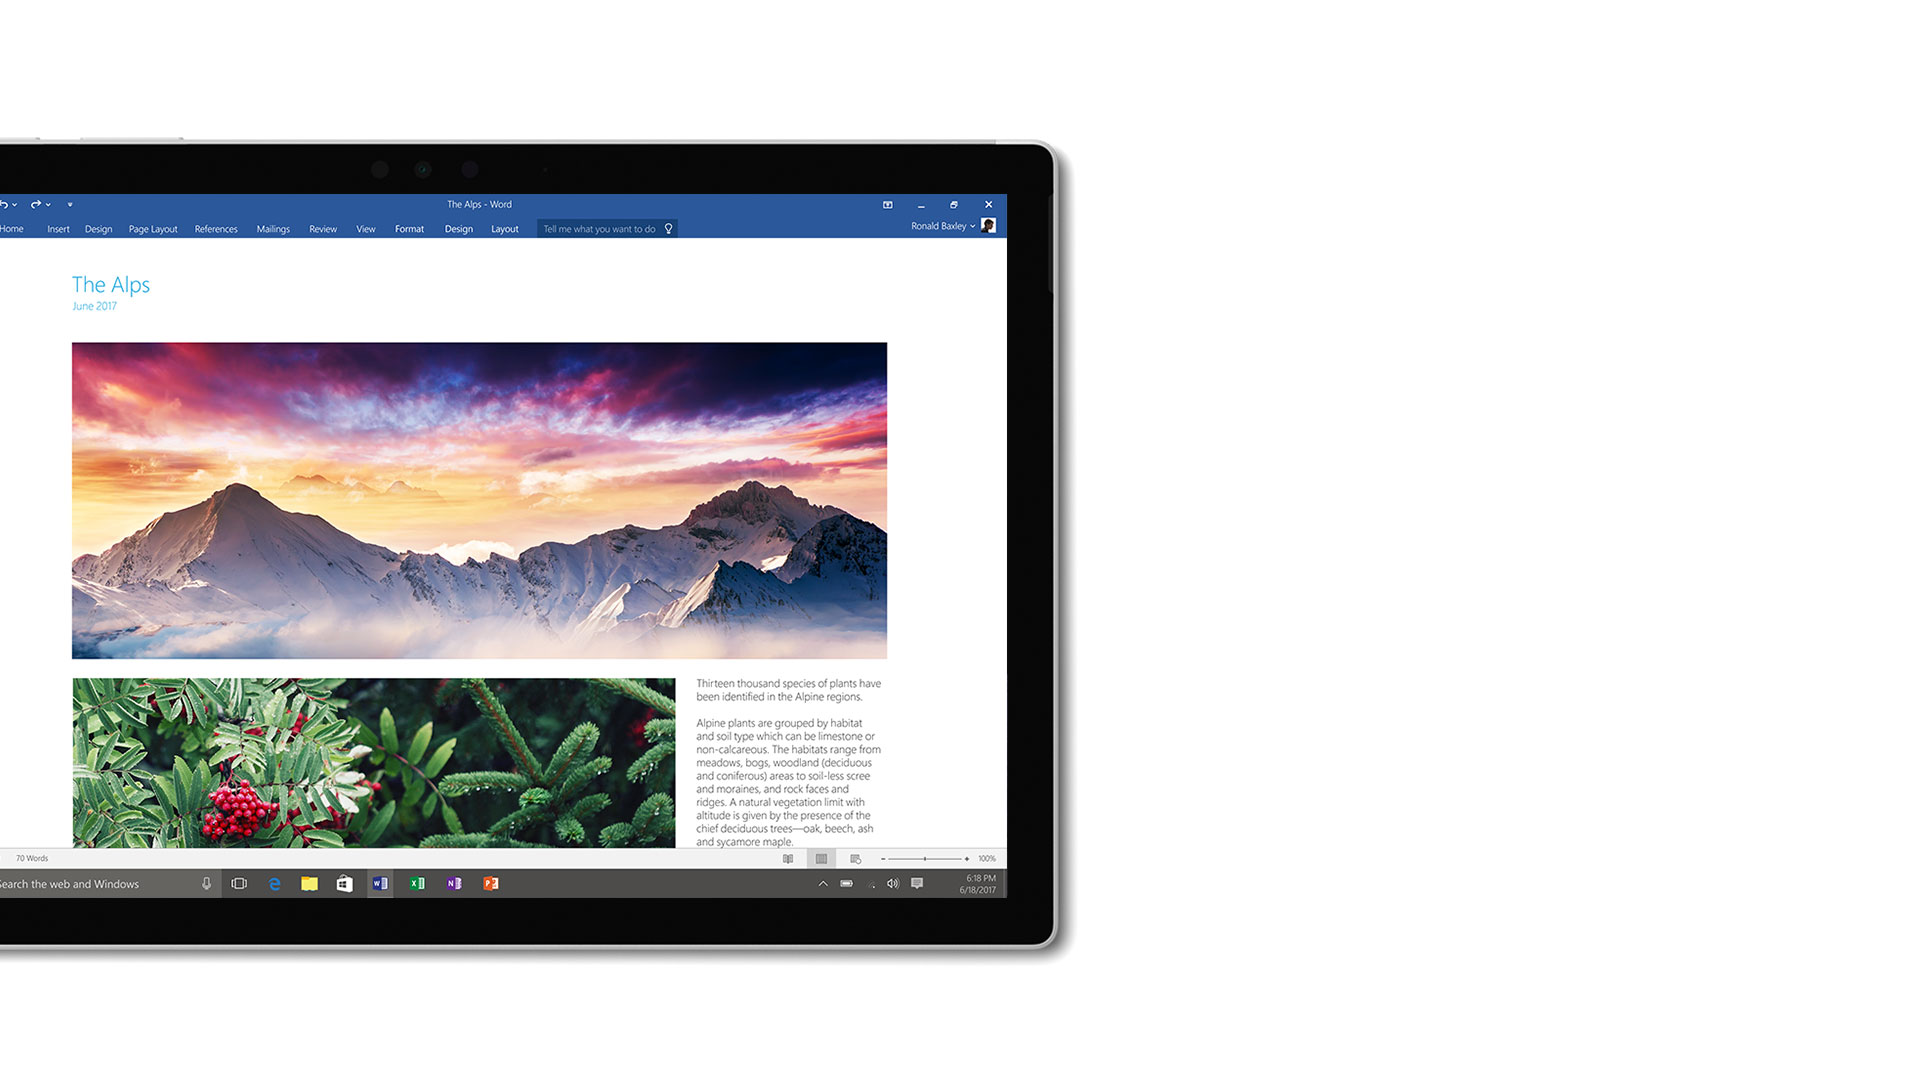 Afbeelding van gebruikersinterface van Microsoft Word